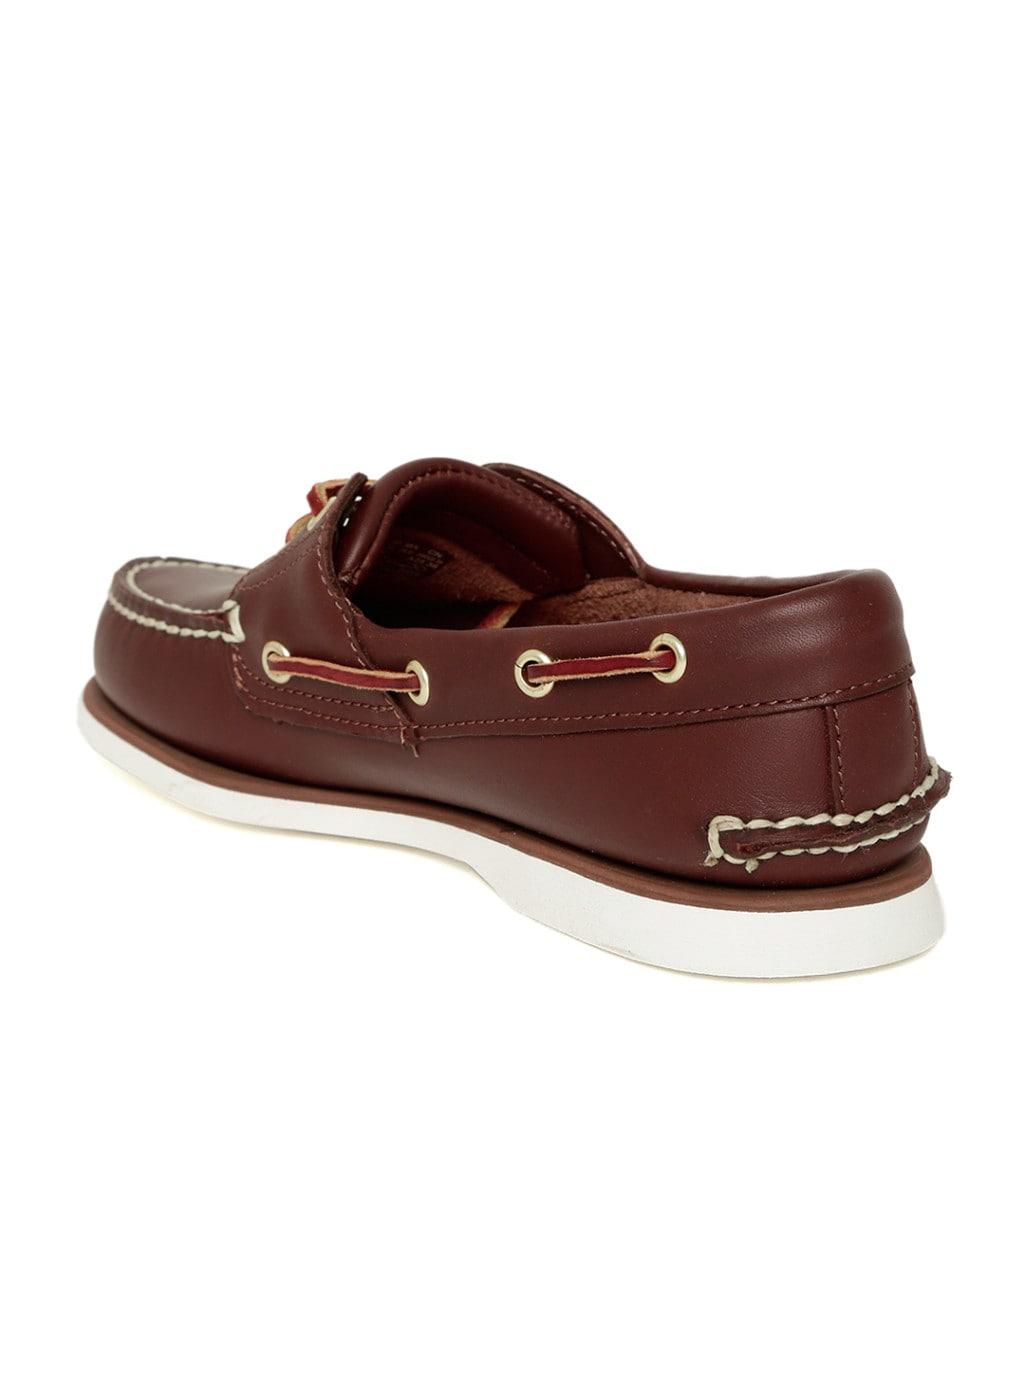 5f23daafdecbd Men Boat Shoes Timberland - Buy Men Boat Shoes Timberland online in India -  Jabong